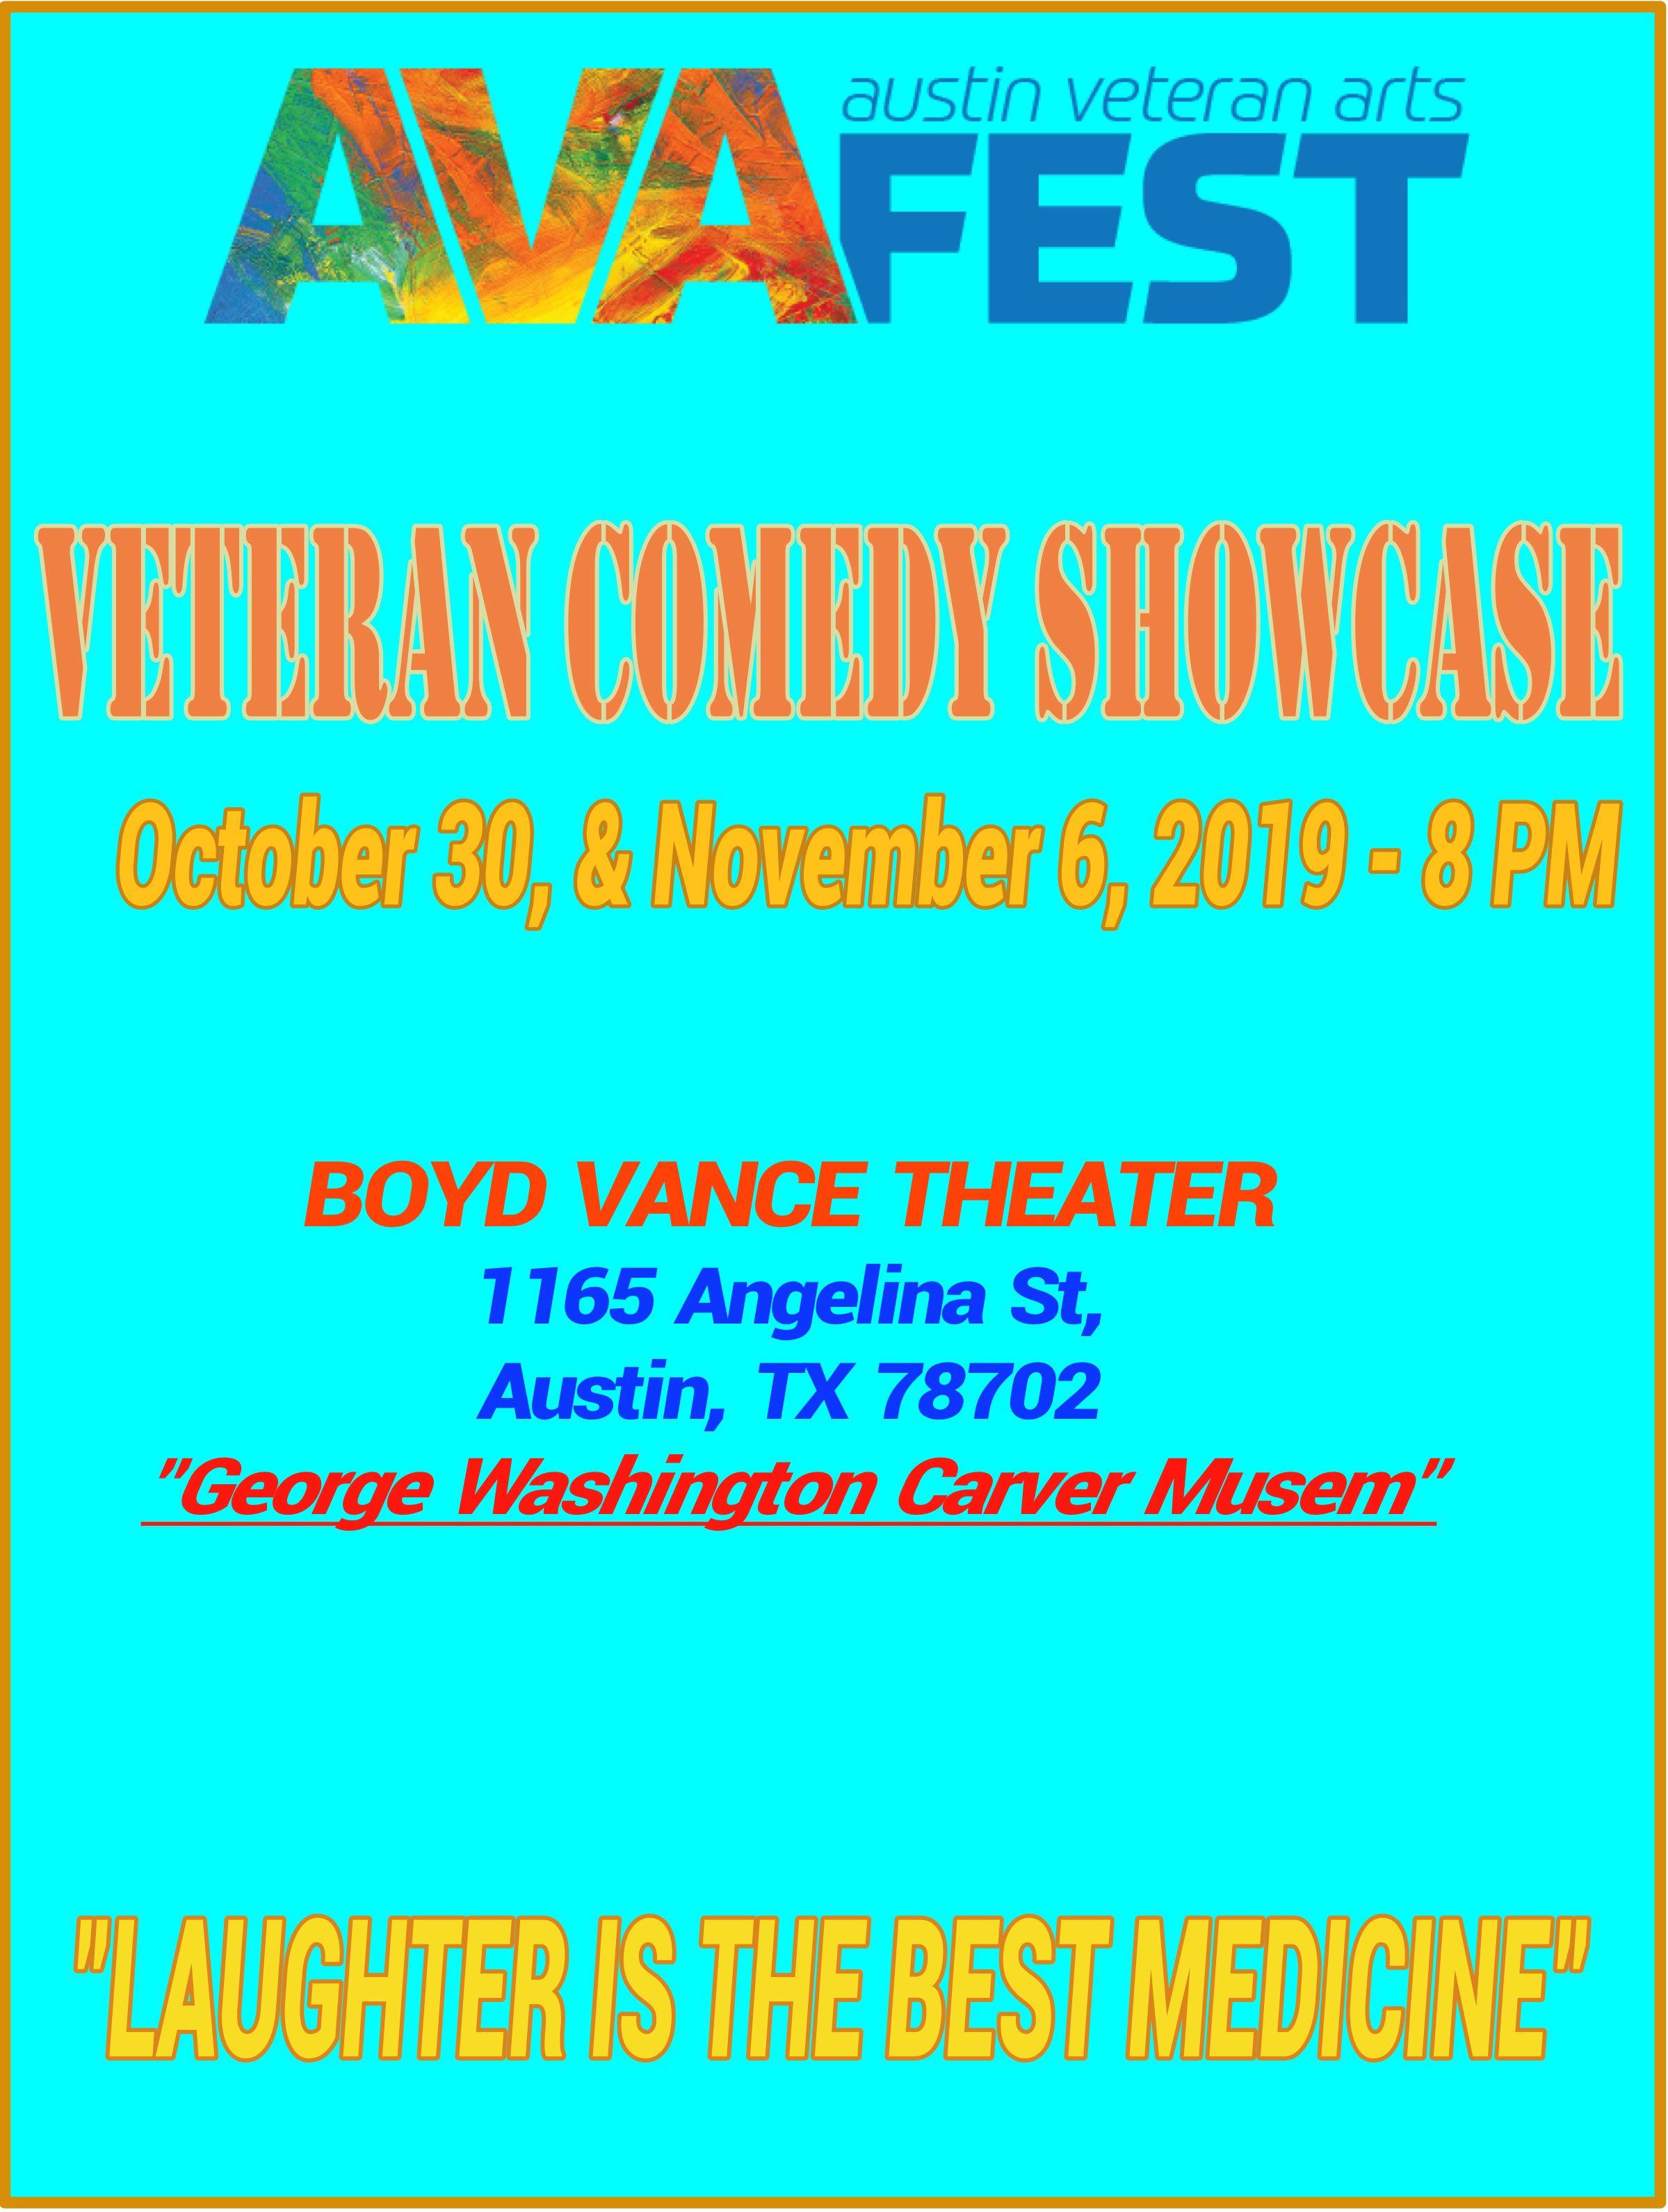 AVAFEST Veteran Comedy Showcase.jpeg